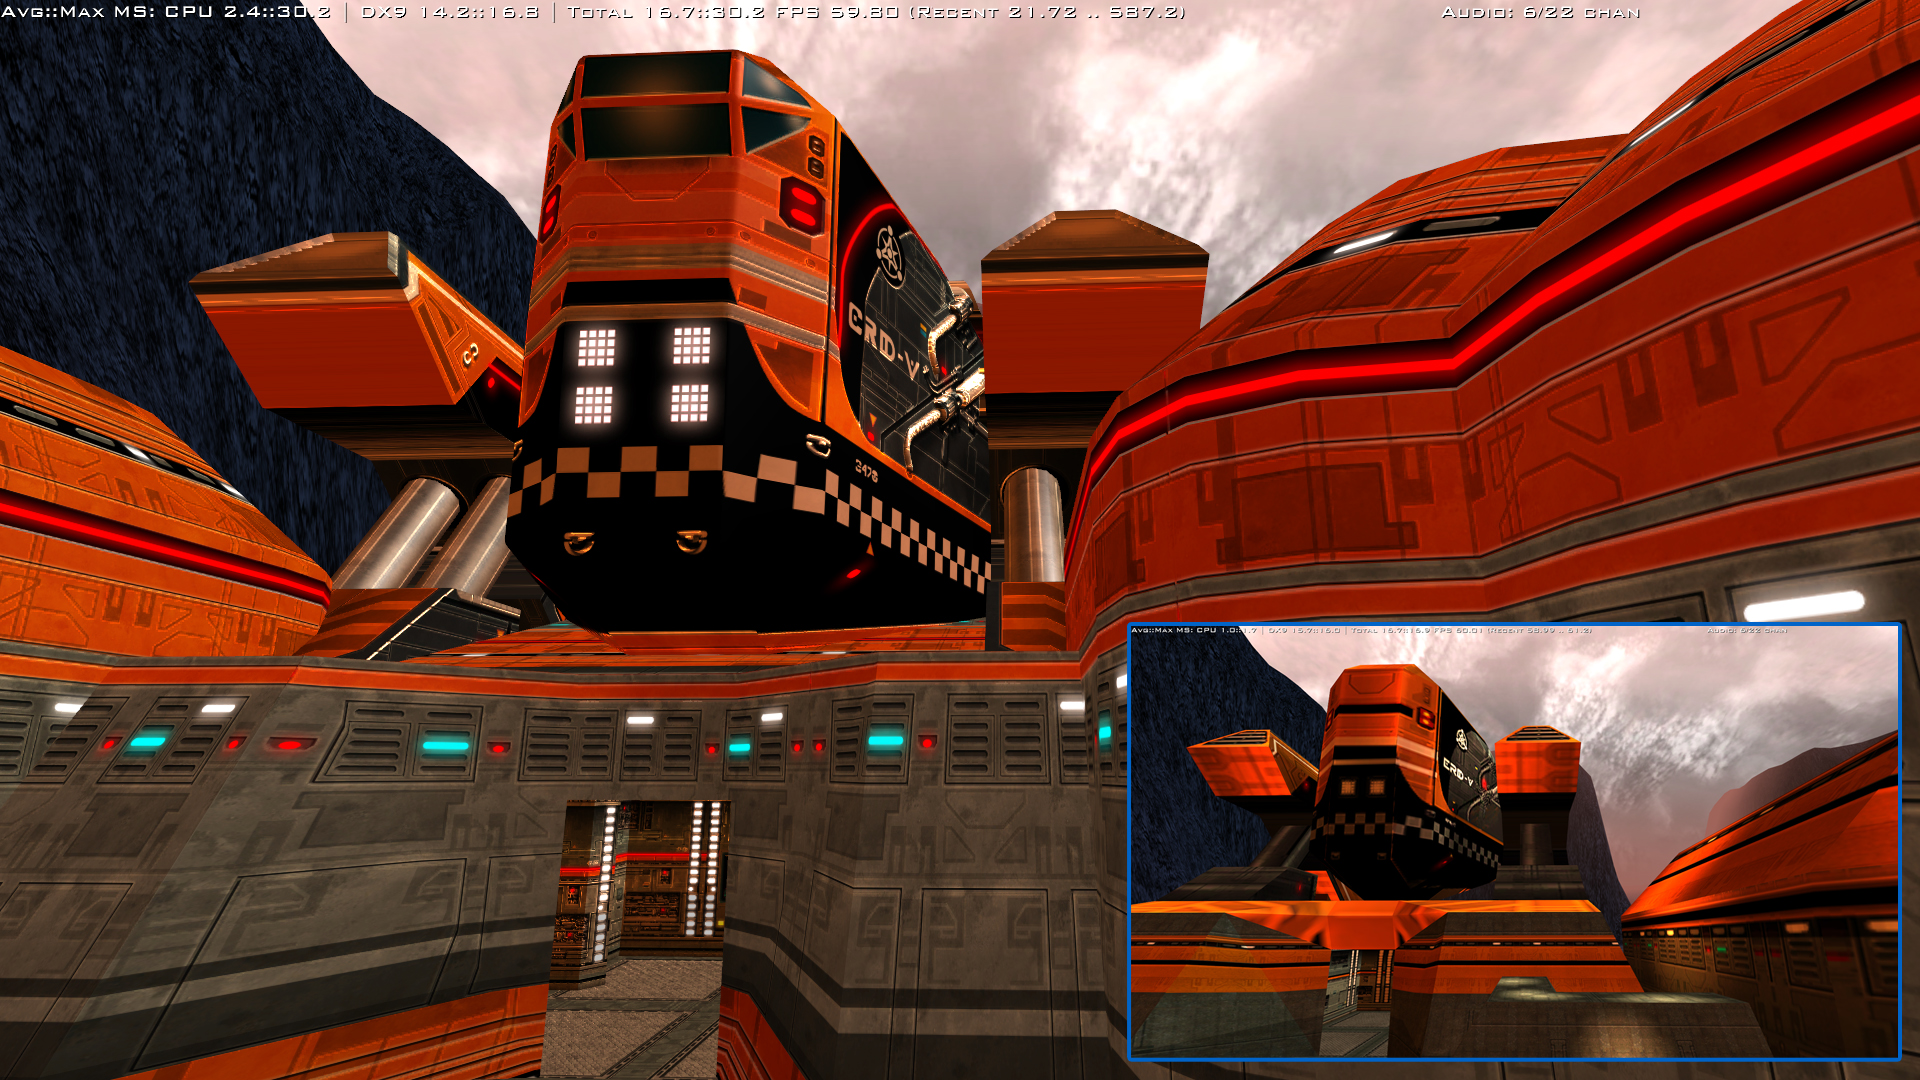 Image 10 battlezone ii remodeled for battlezone ii for Battlezone 2